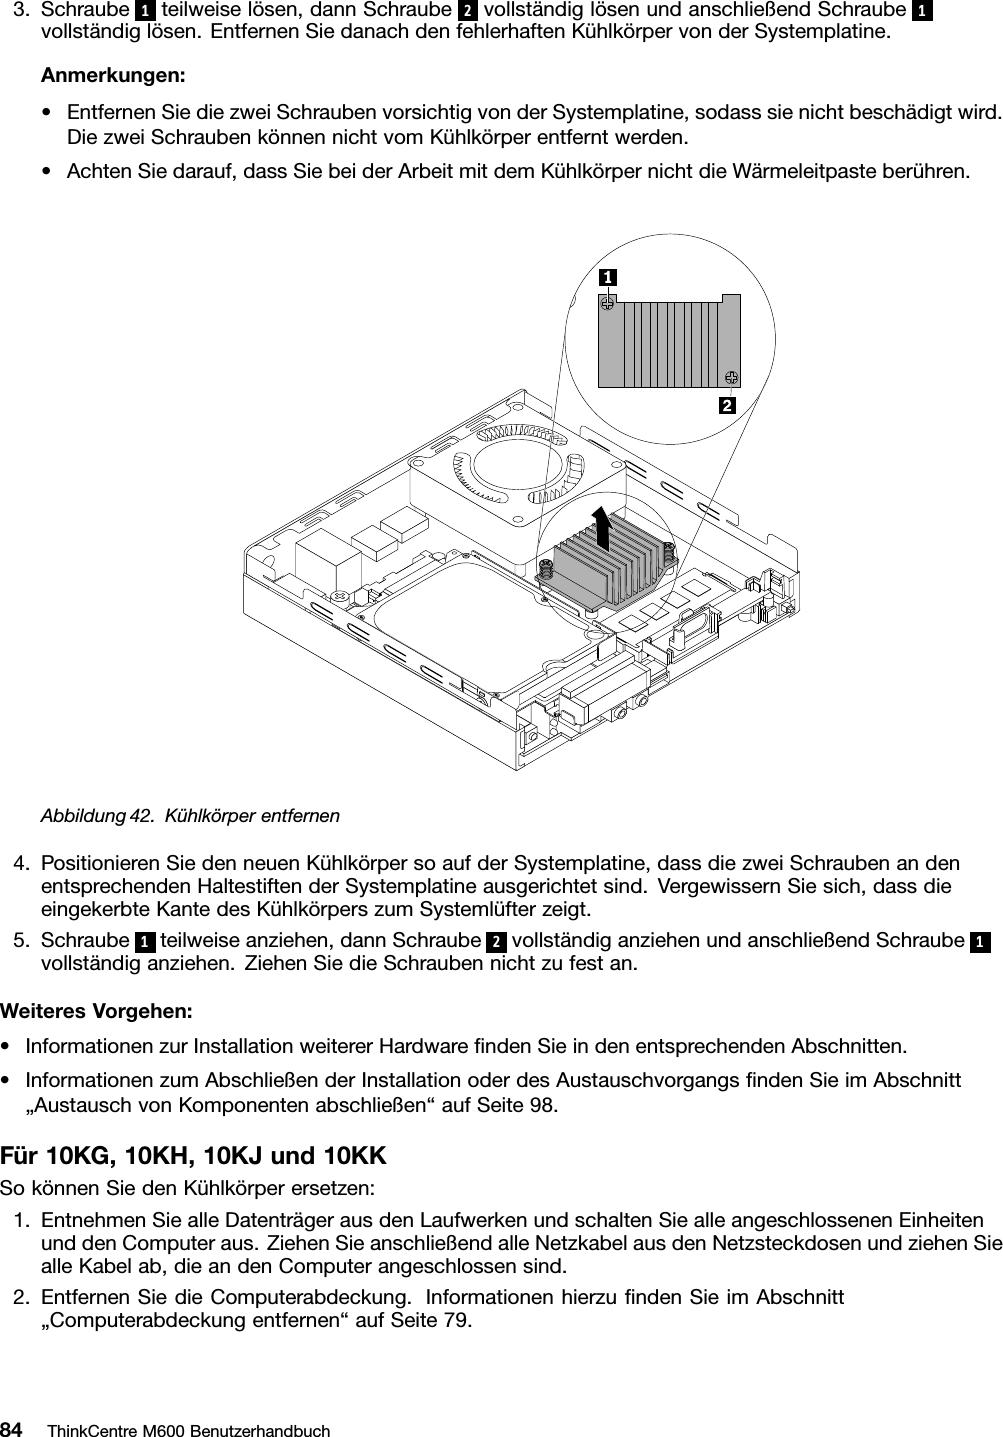 3590S 6 MM Knob Präzision Präzise Potentiometer Wahlknopf Schloss Hut  ZBDE